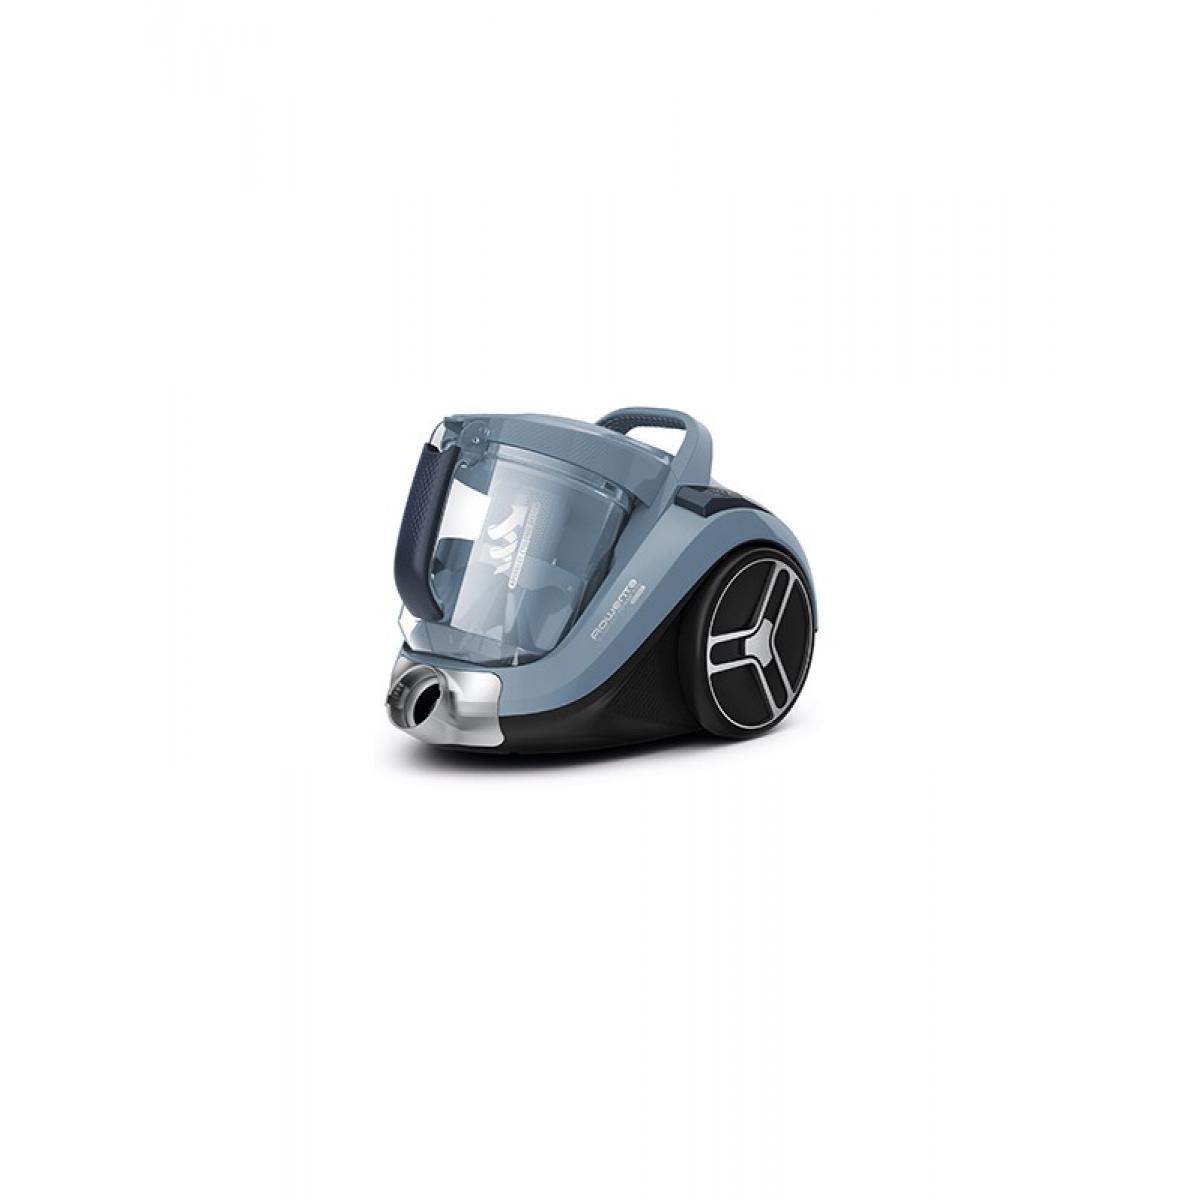 Rowenta Aspirateur sans sac Rowenta RO4871EA Compact Power Cyclonic XXL